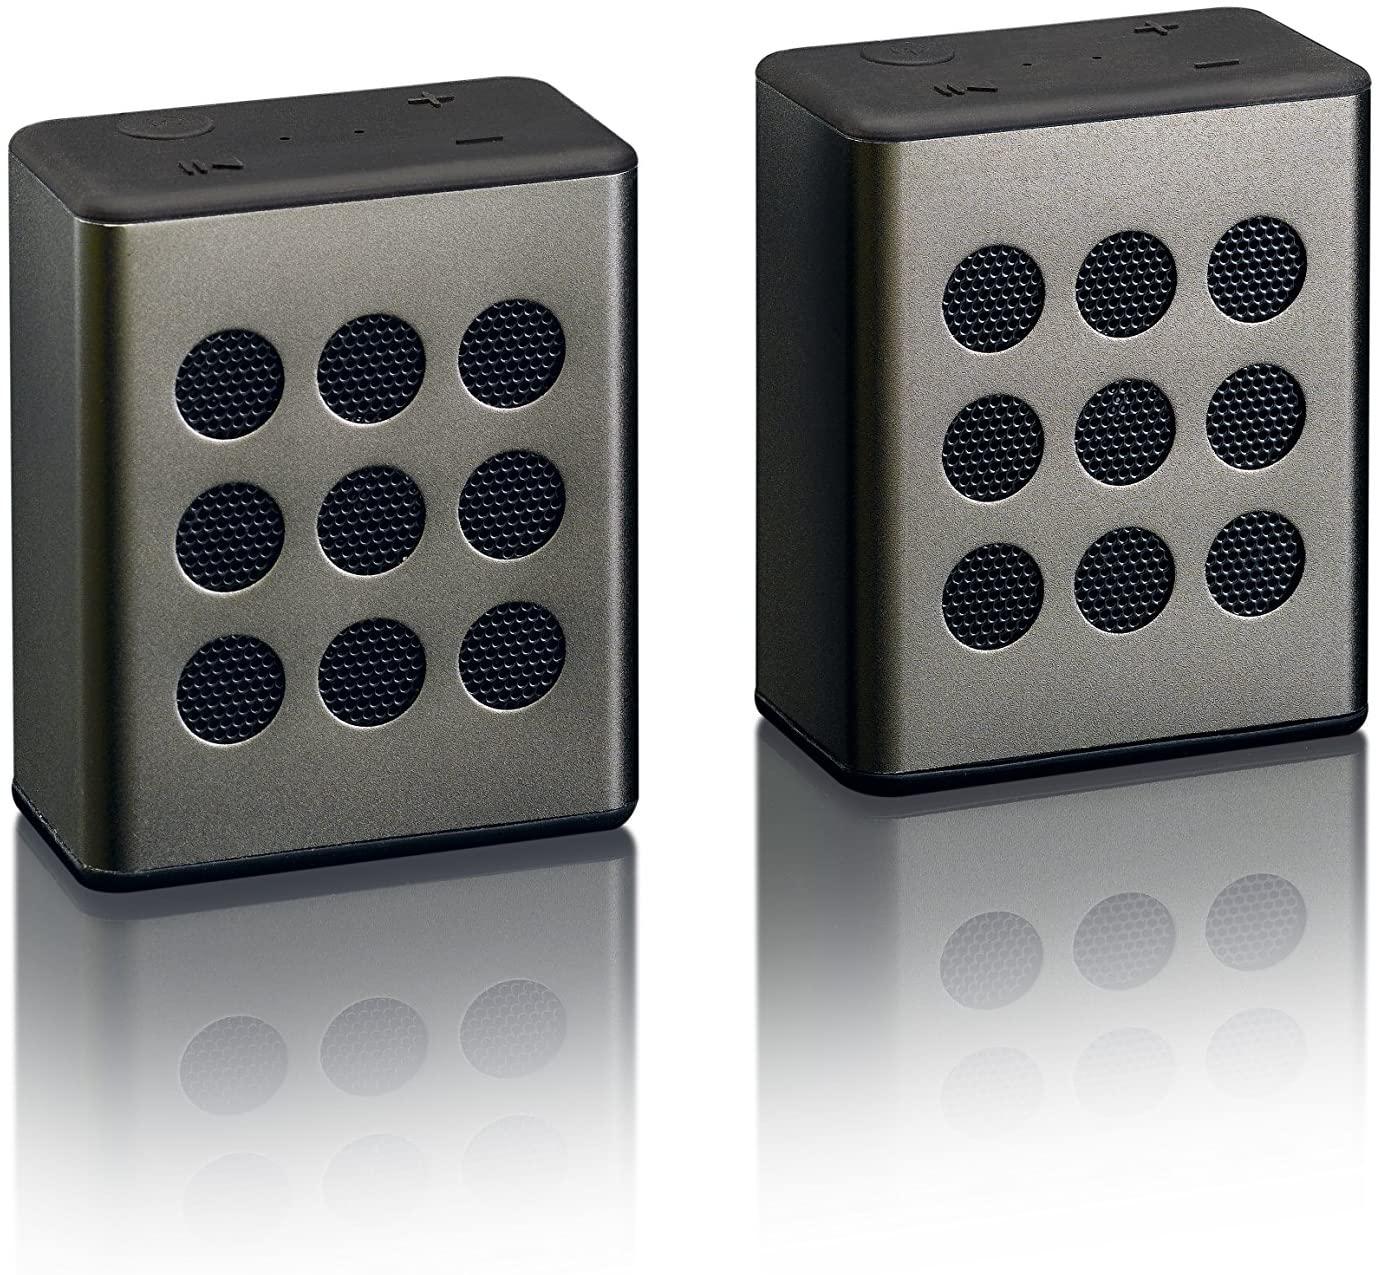 Lenco BTP-200 Bluetooth-Lautsprecher Stereo-Set (2x 2.5W, ~8h Akkulaufzeit, AUX-In, Mikrofon)